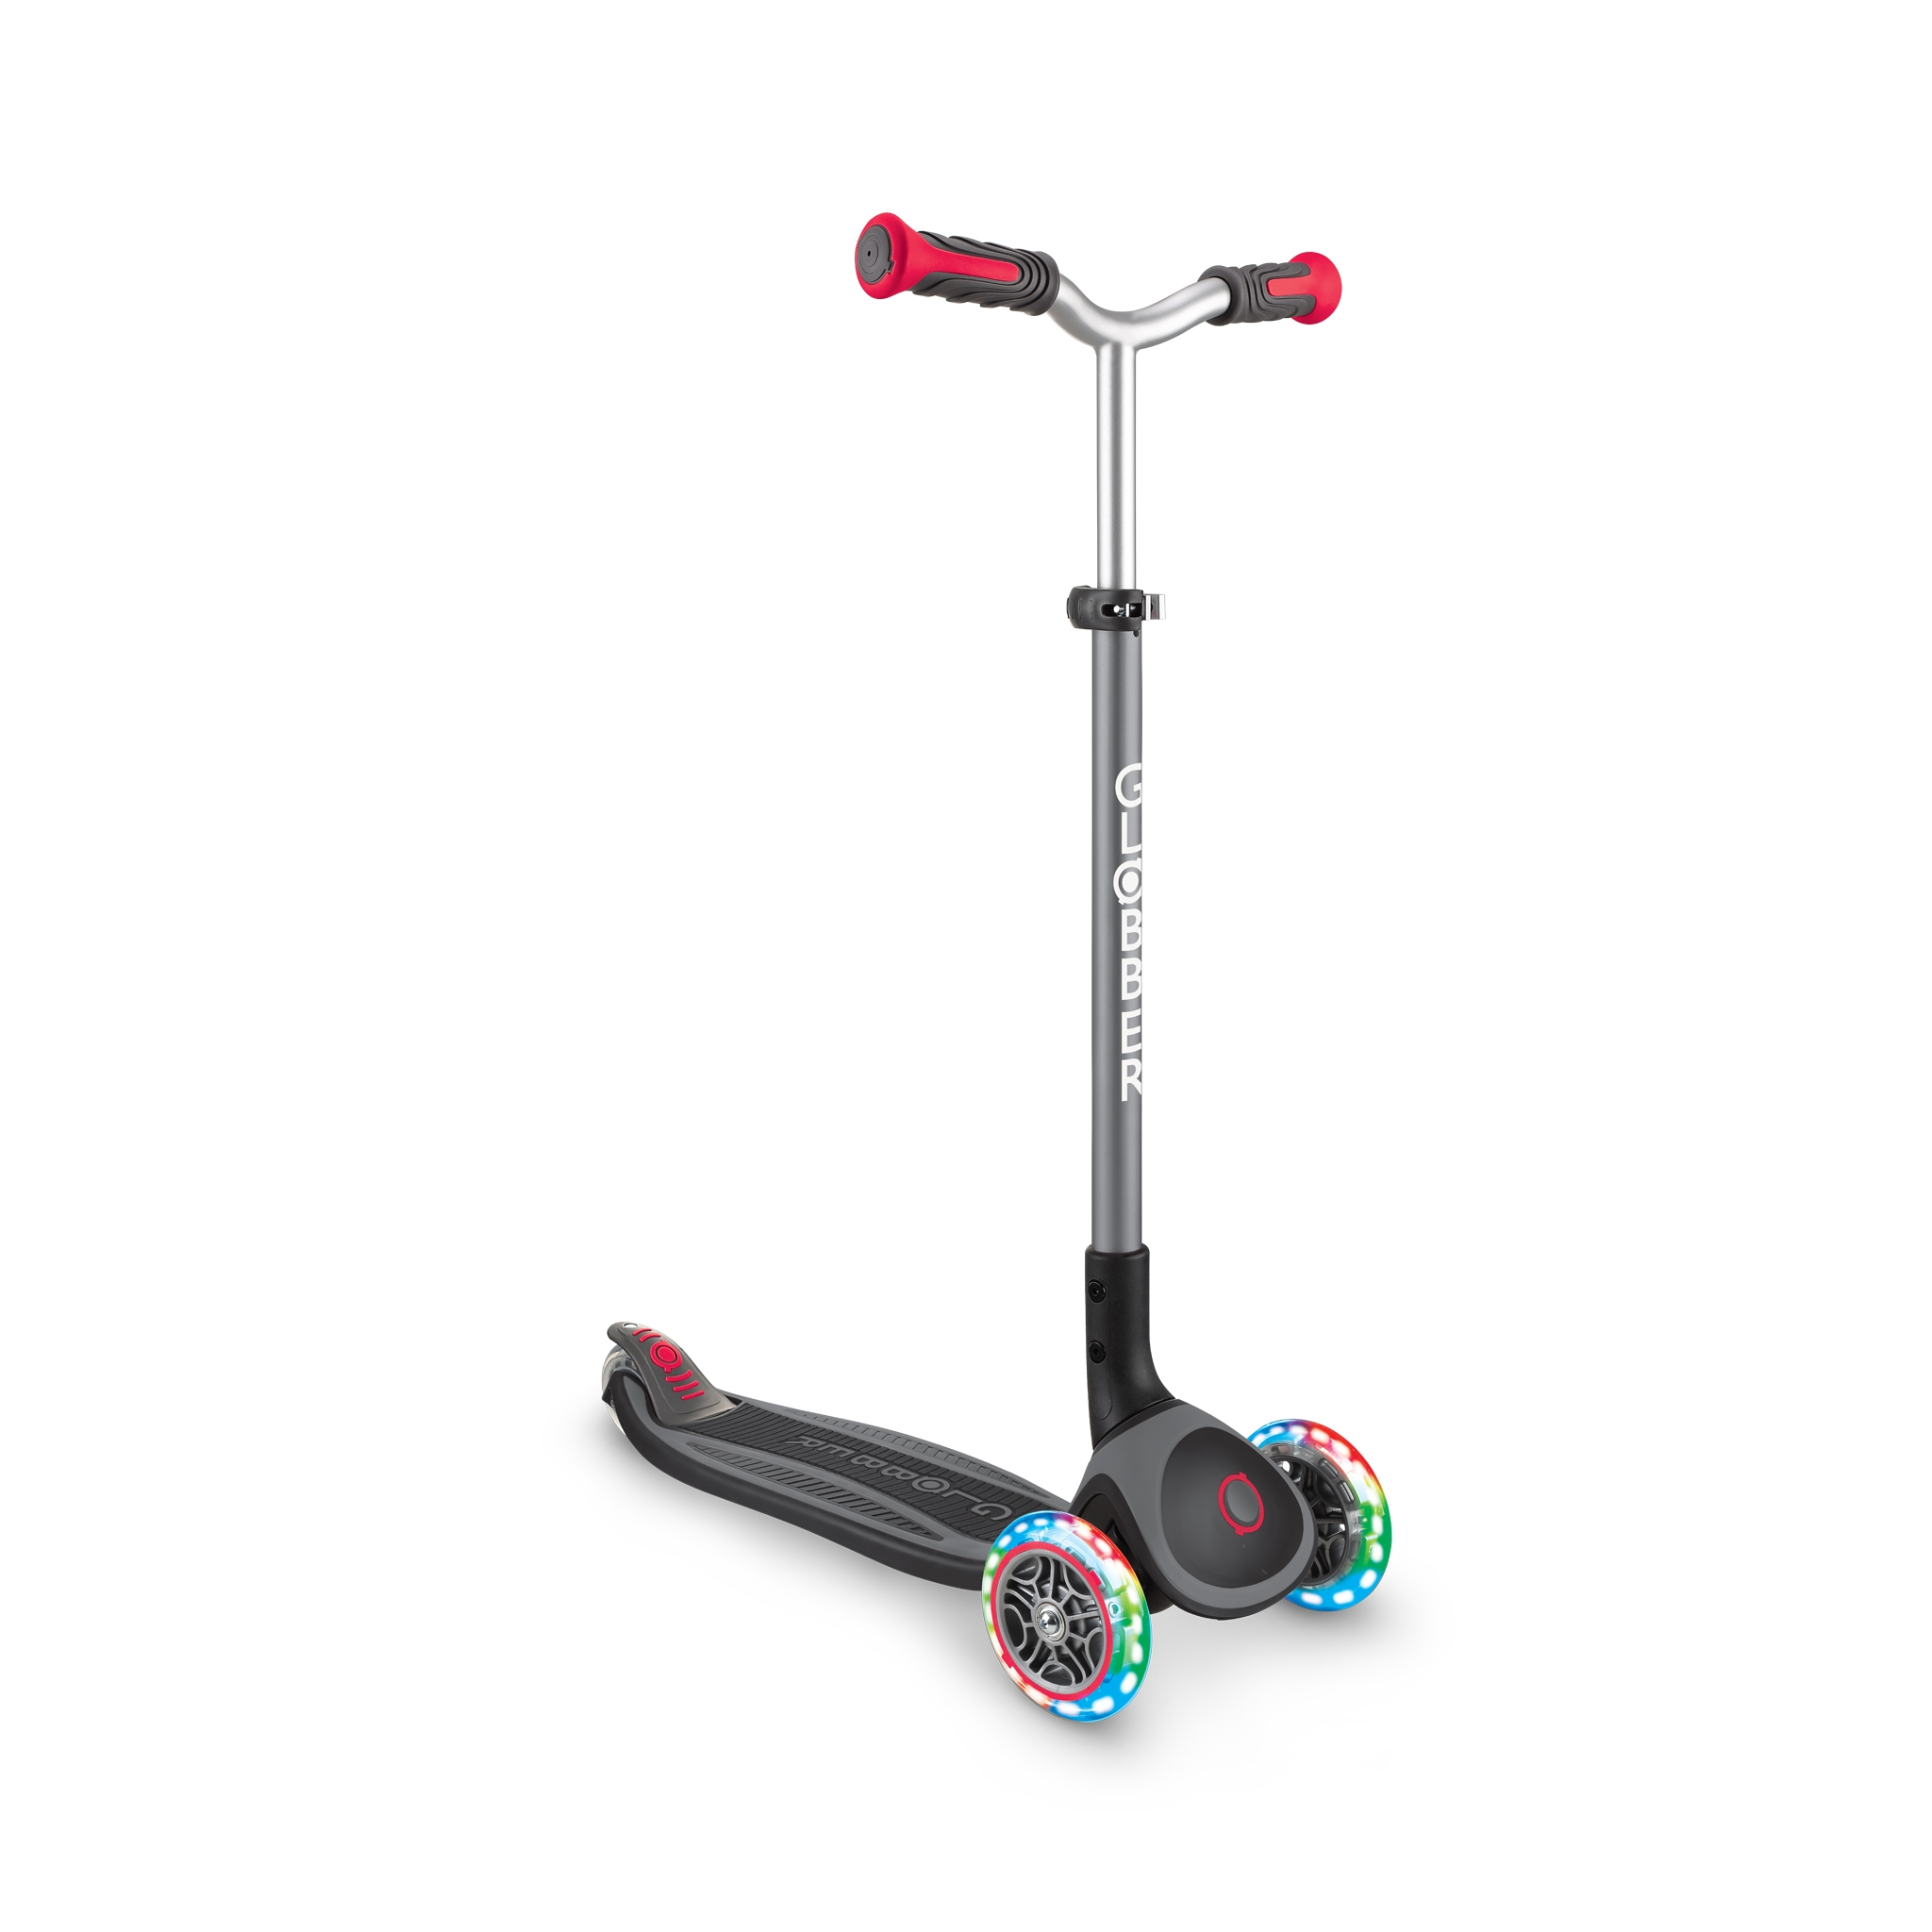 Globber-MASTER-LIGHTS-premium-3-wheel-foldable-light-up-scooter-for-kids-aged-4-to-14_black-red